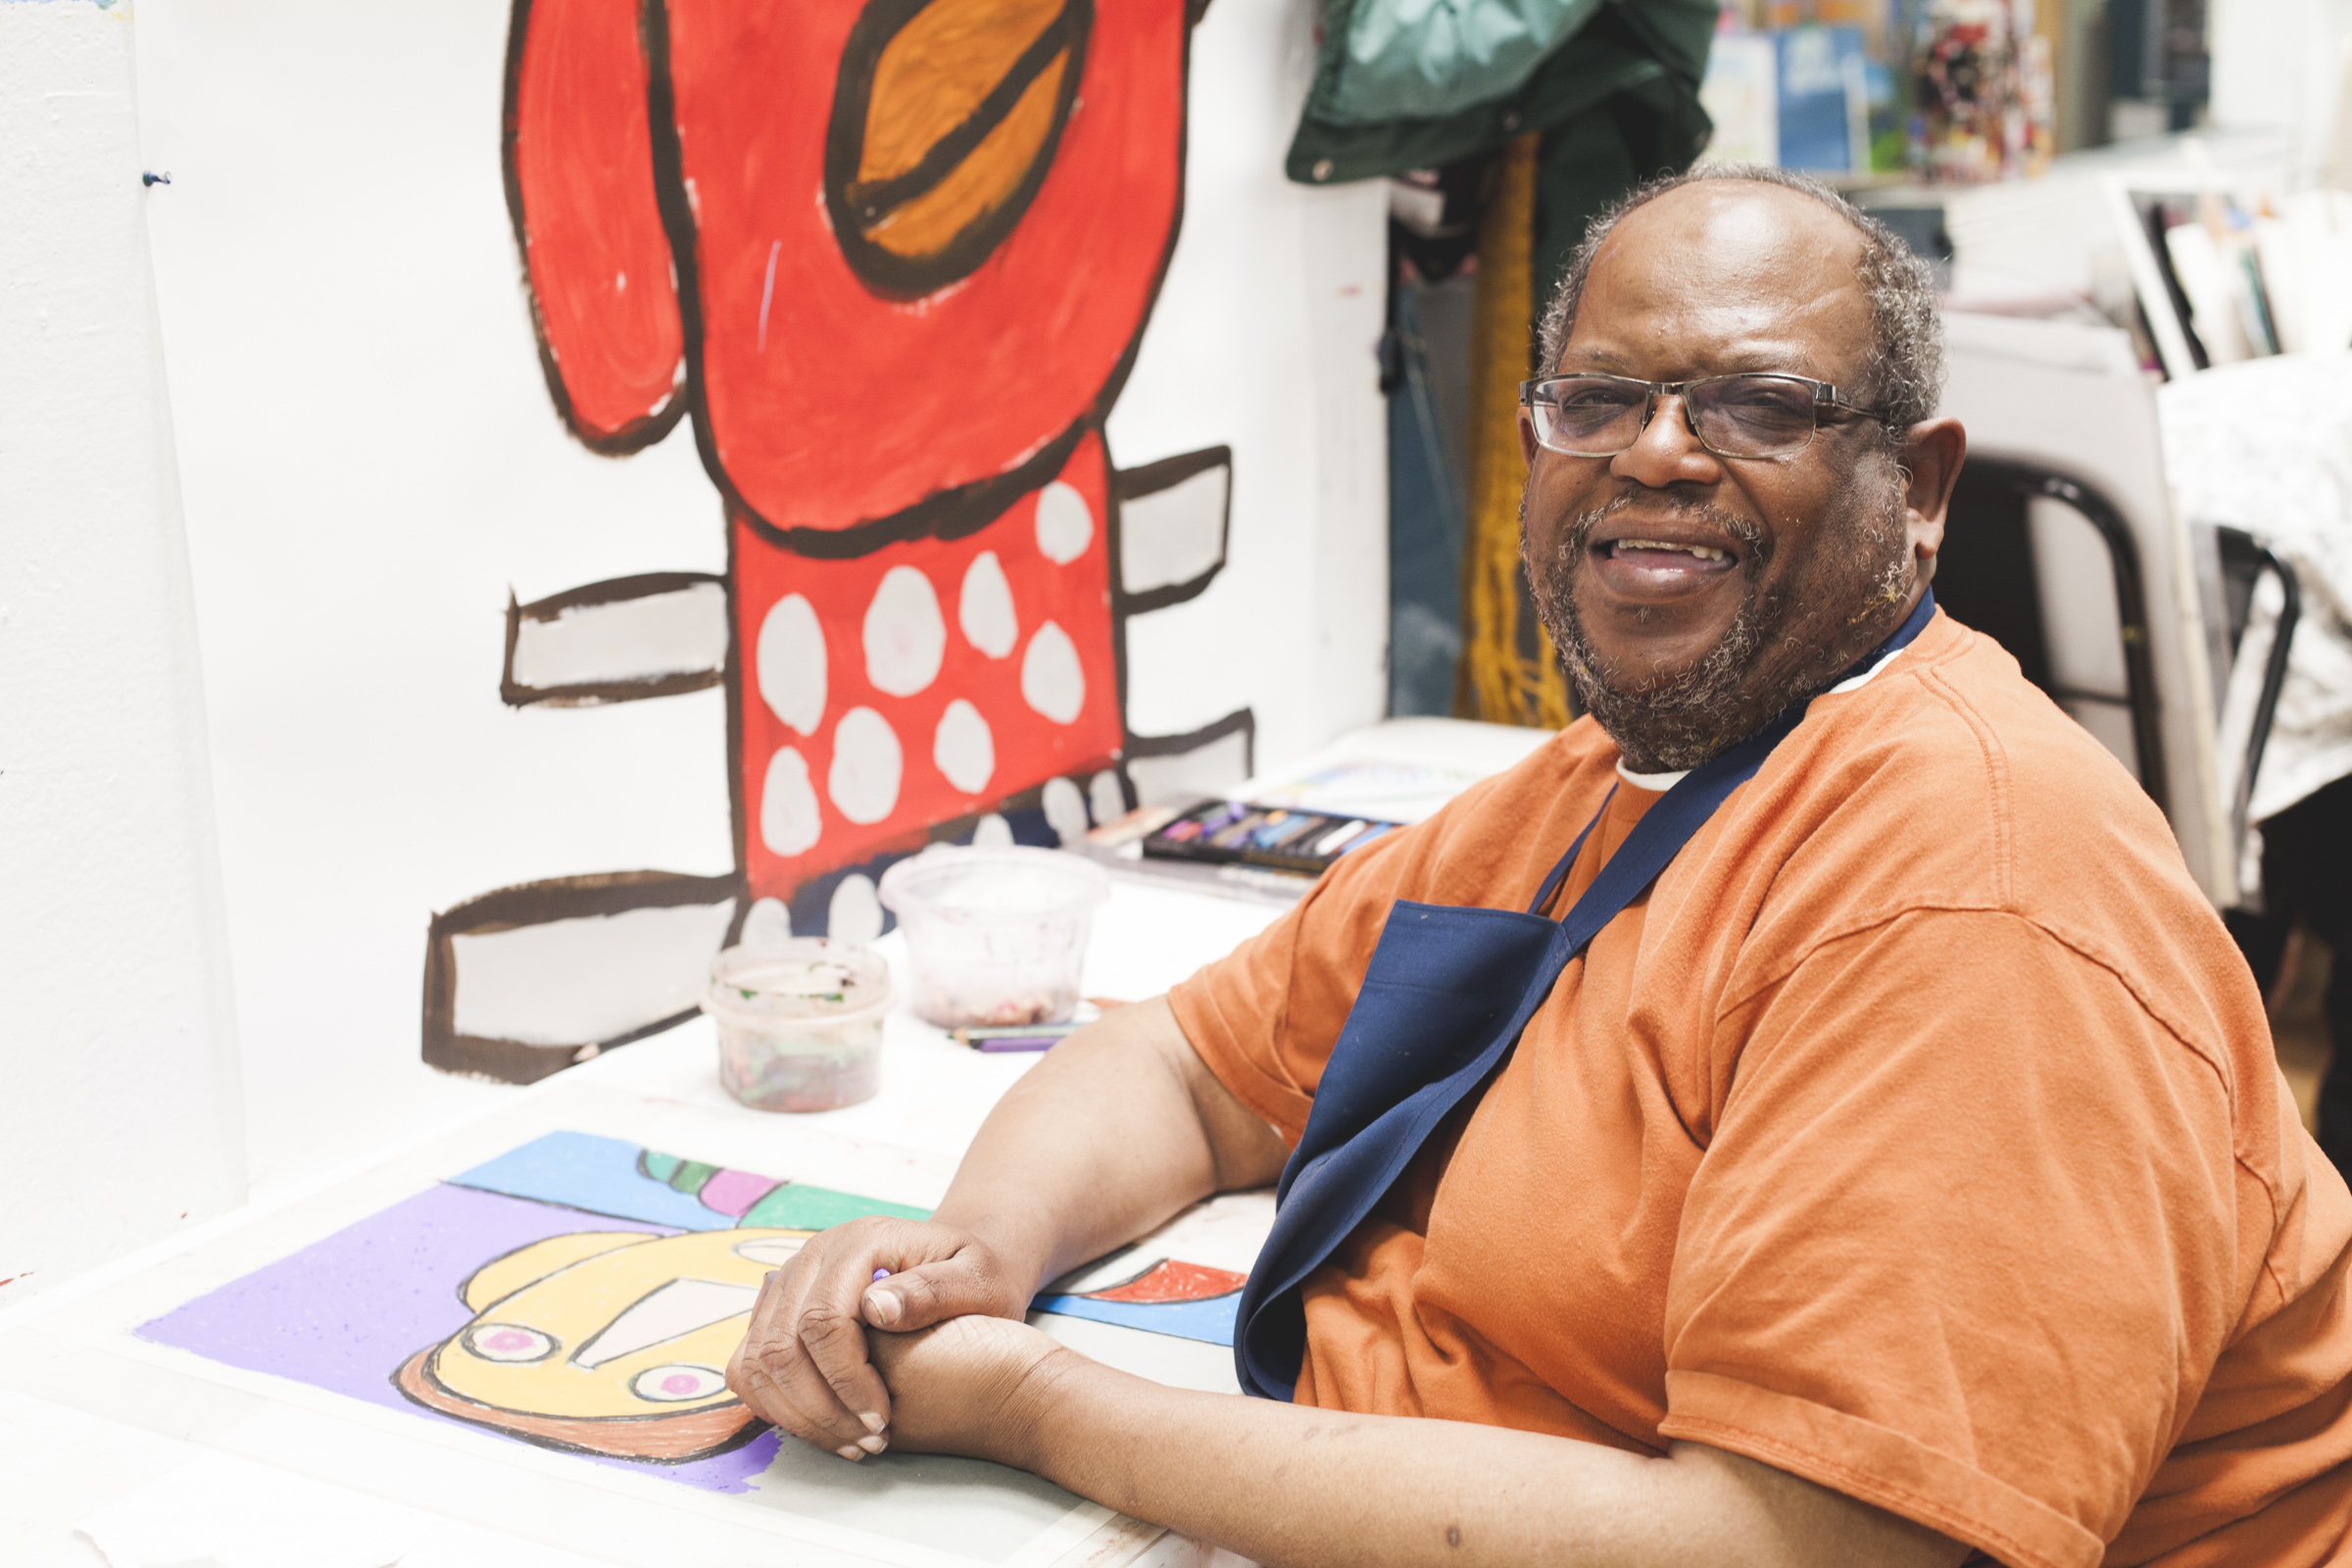 Creativity Explored artist Vincent Jackson